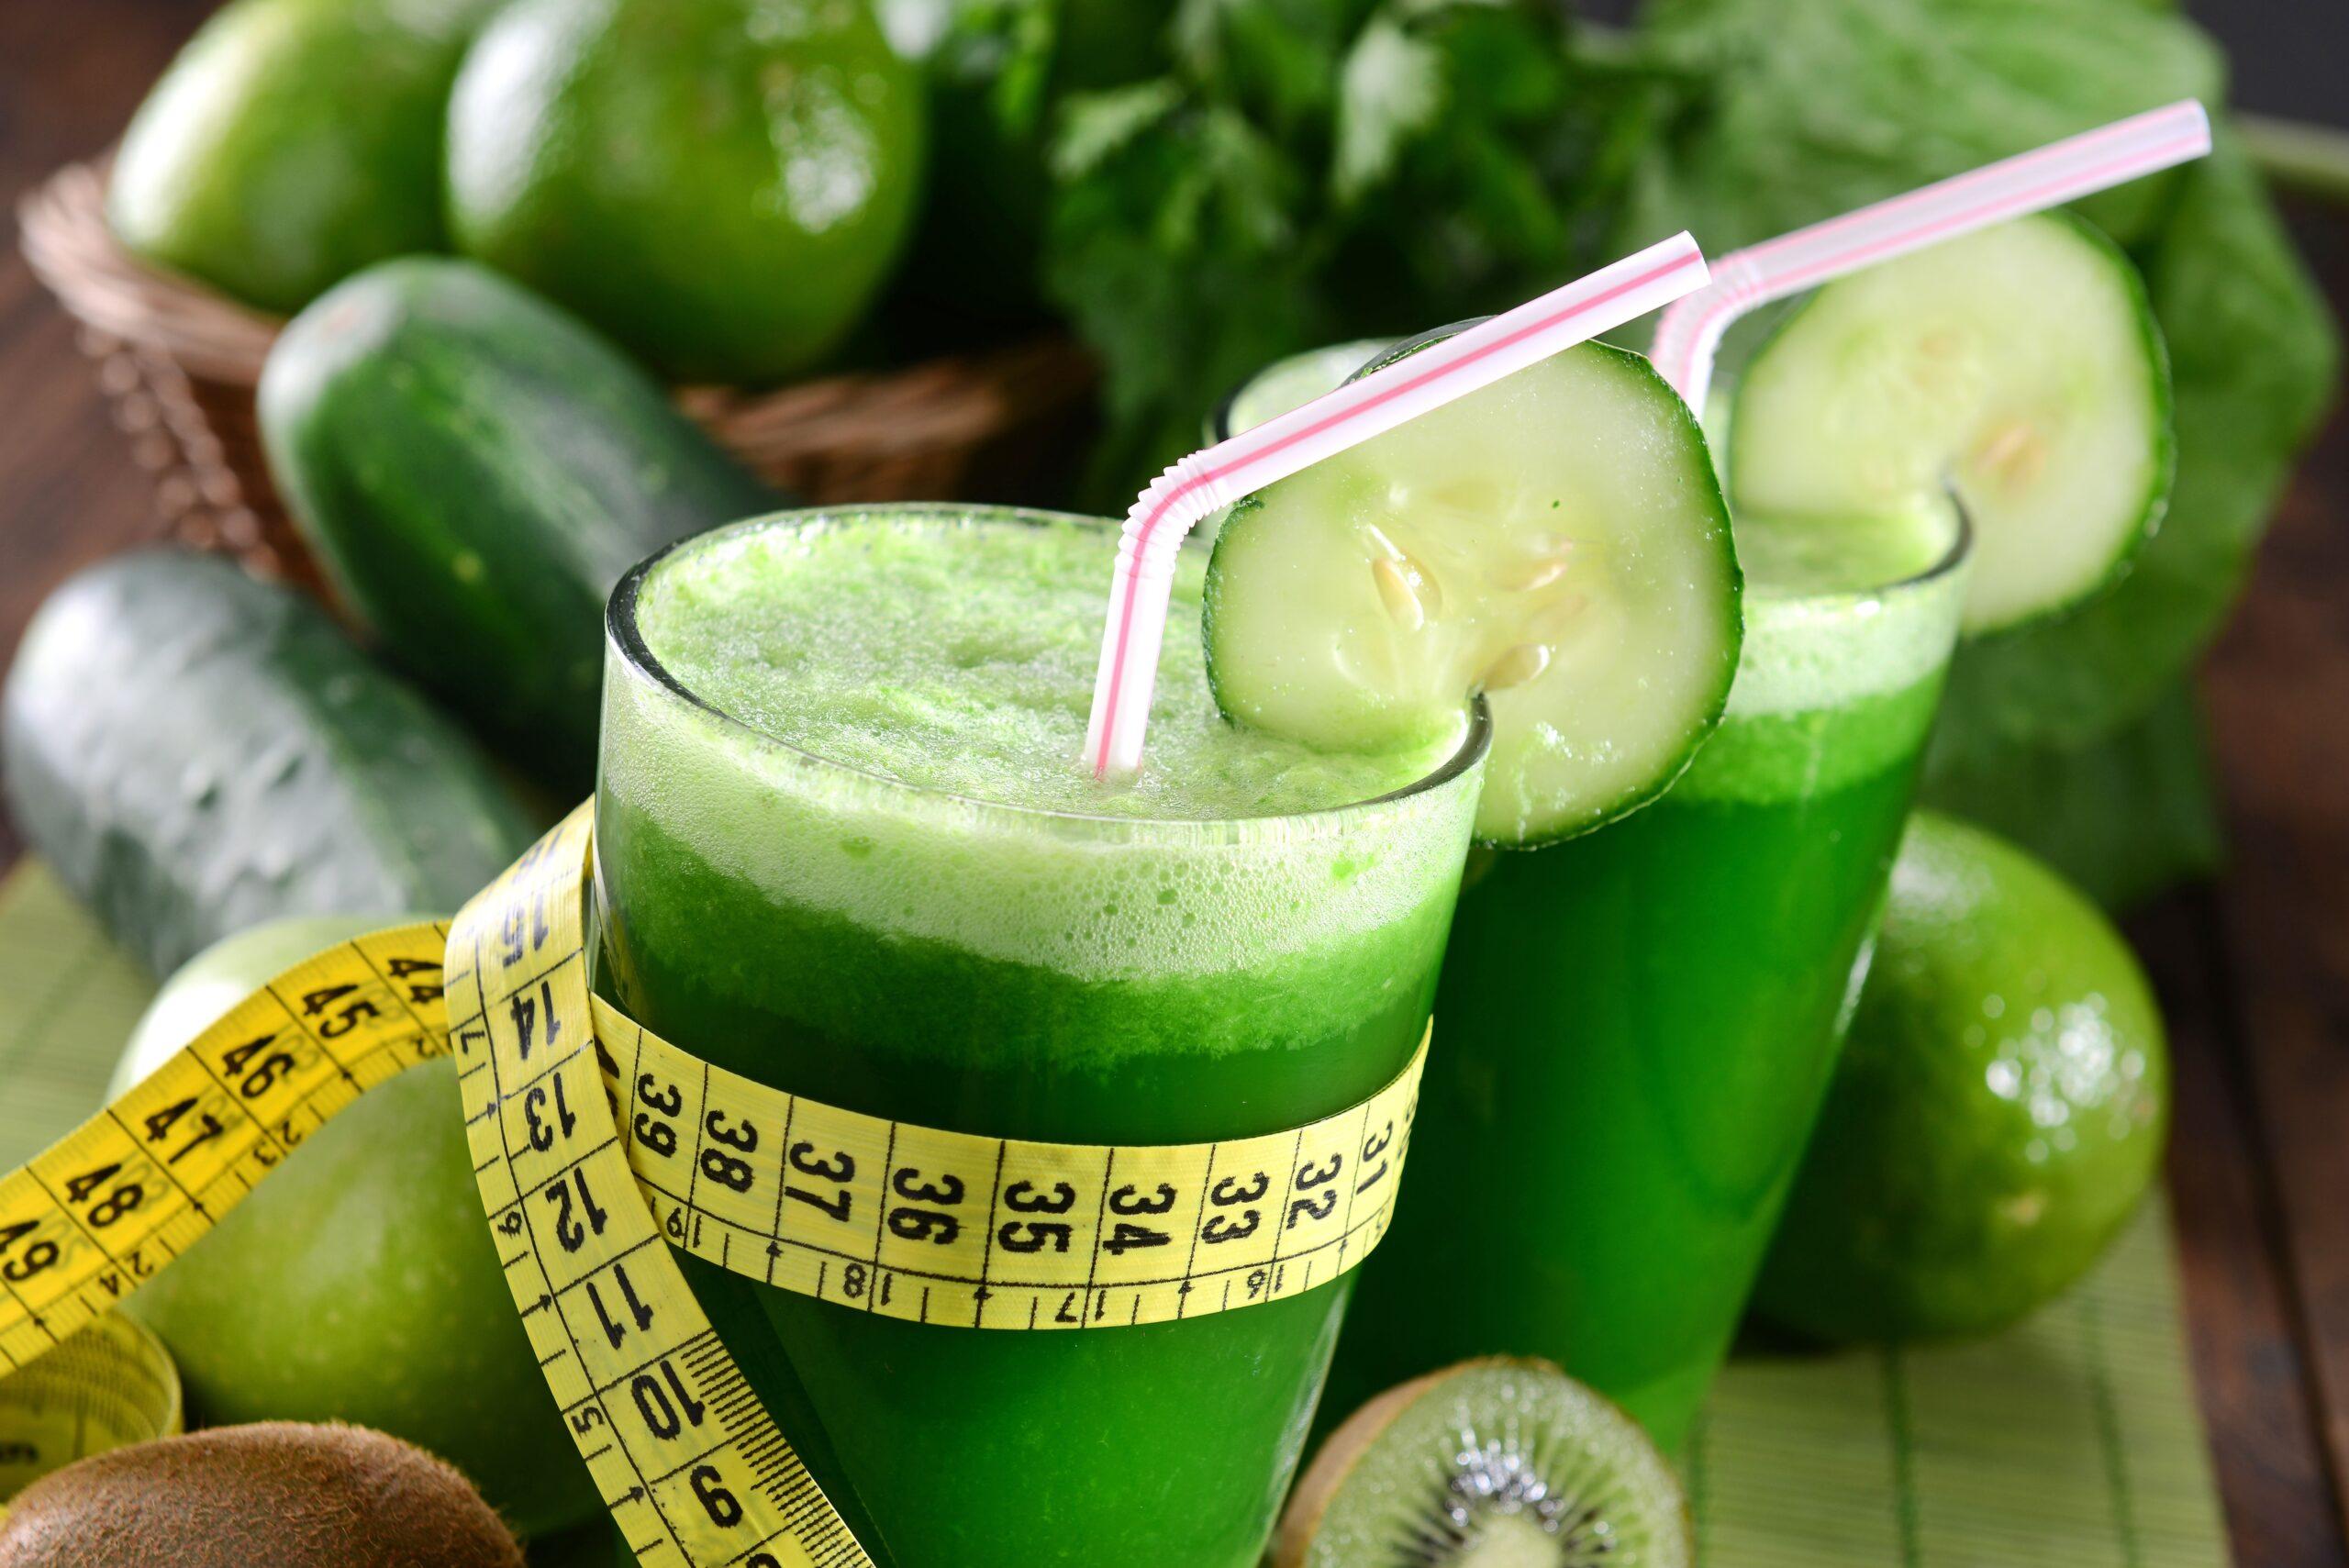 Dieta Detox: 3 giorni per depurarti